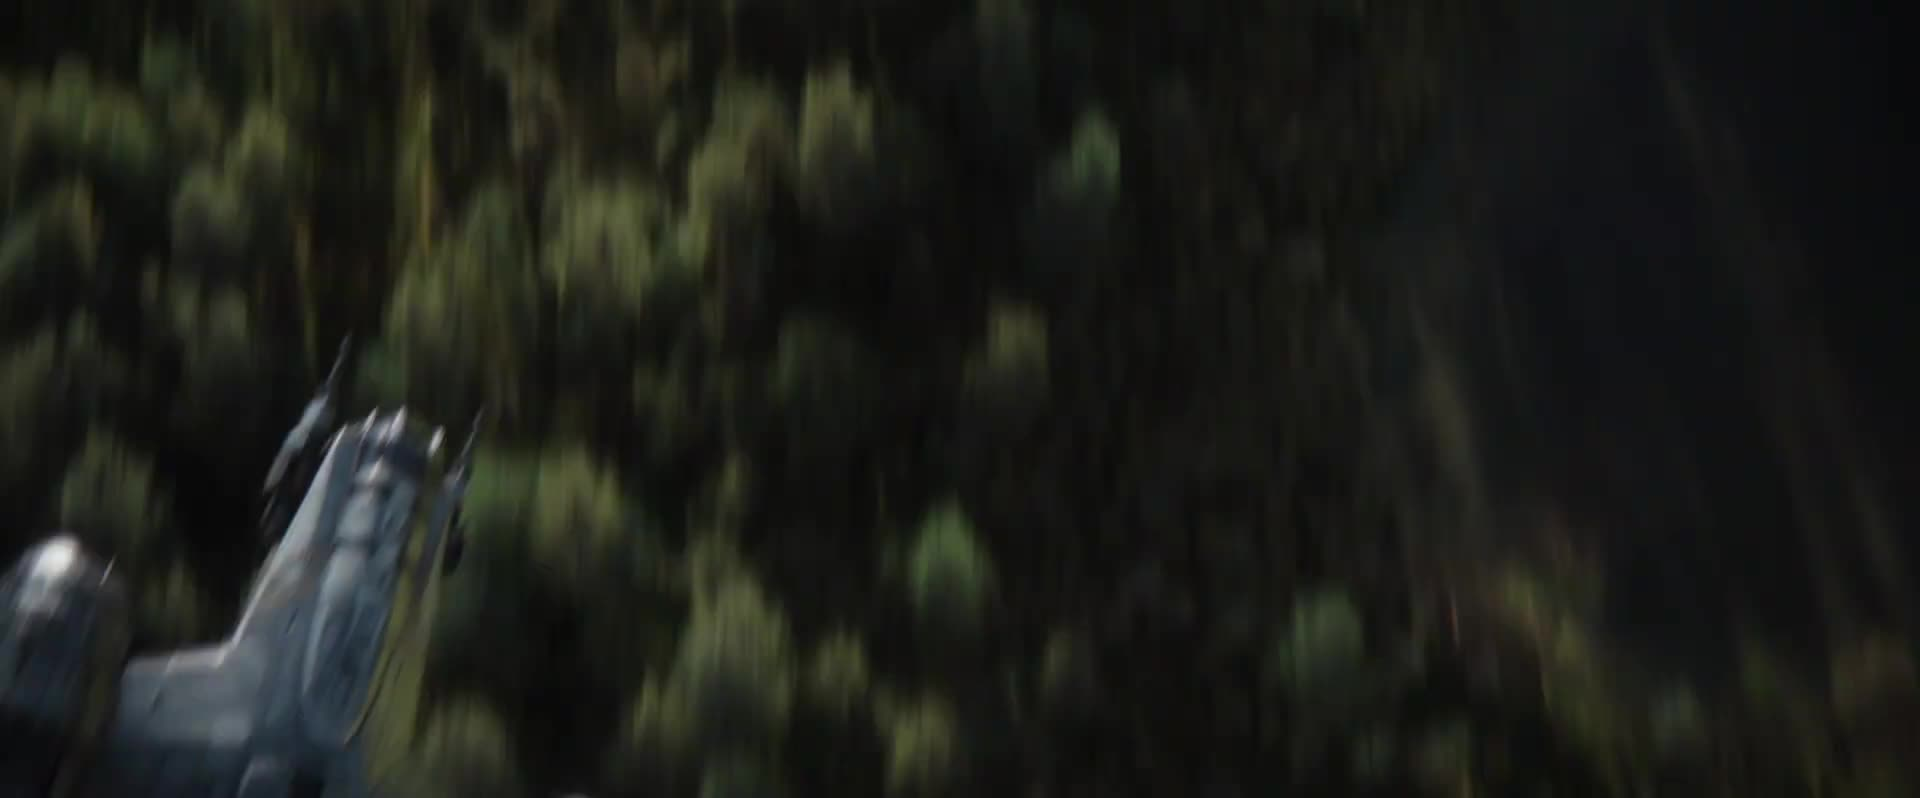 The Mandalorian - Official Trailer [HD] screen capture